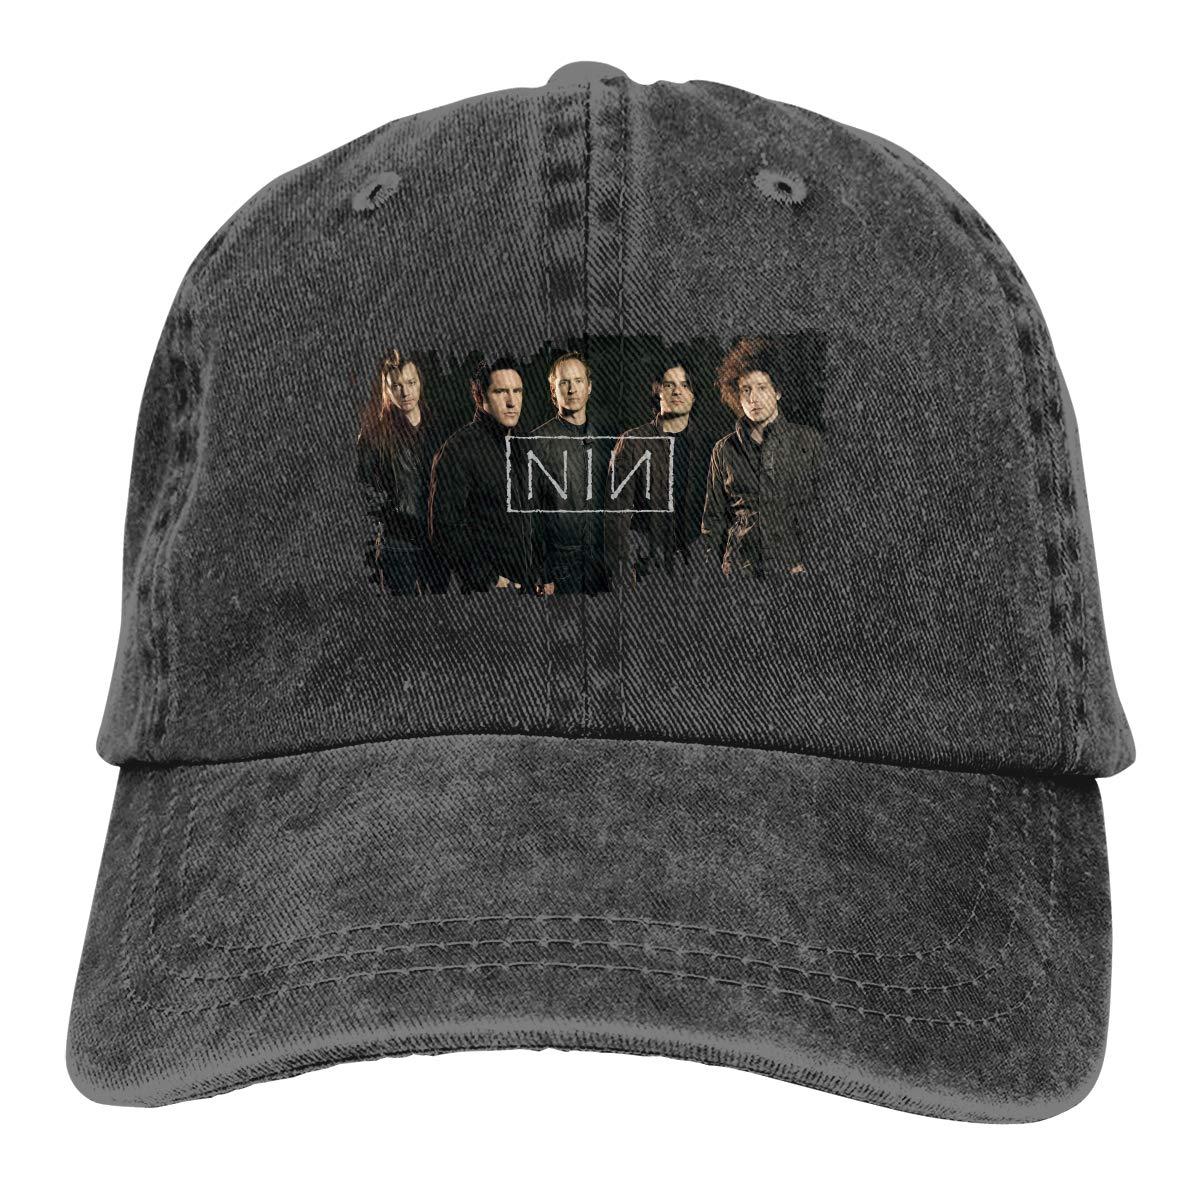 04bcc3424bca Nine Inch Nails Rock Band NIN Unisex Adjustable Baseball Dad Cap Hat ...